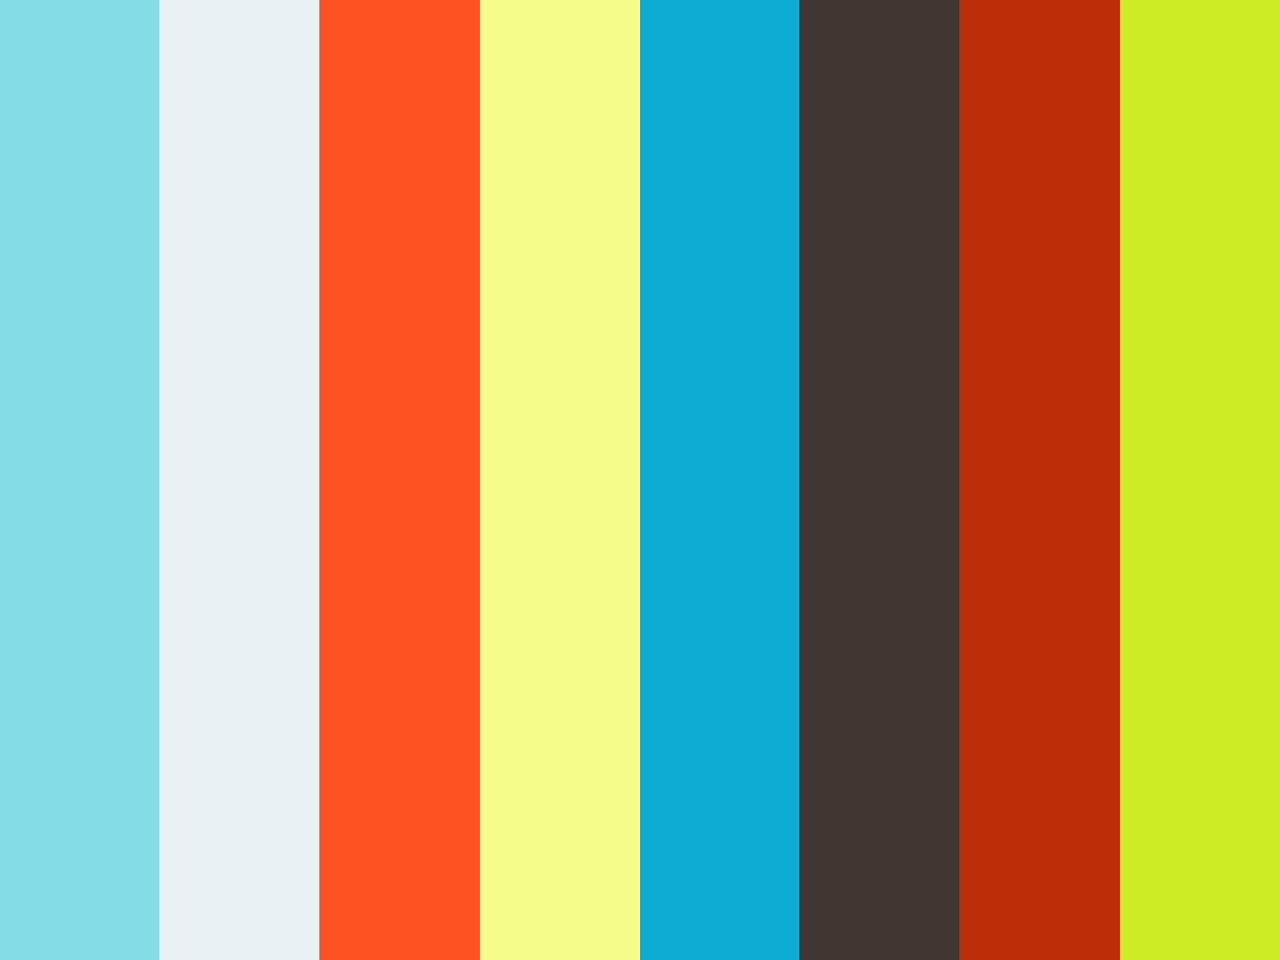 002735 - CORP - Ohlala BehaKlas - Tip 03 - Beha Te Klein